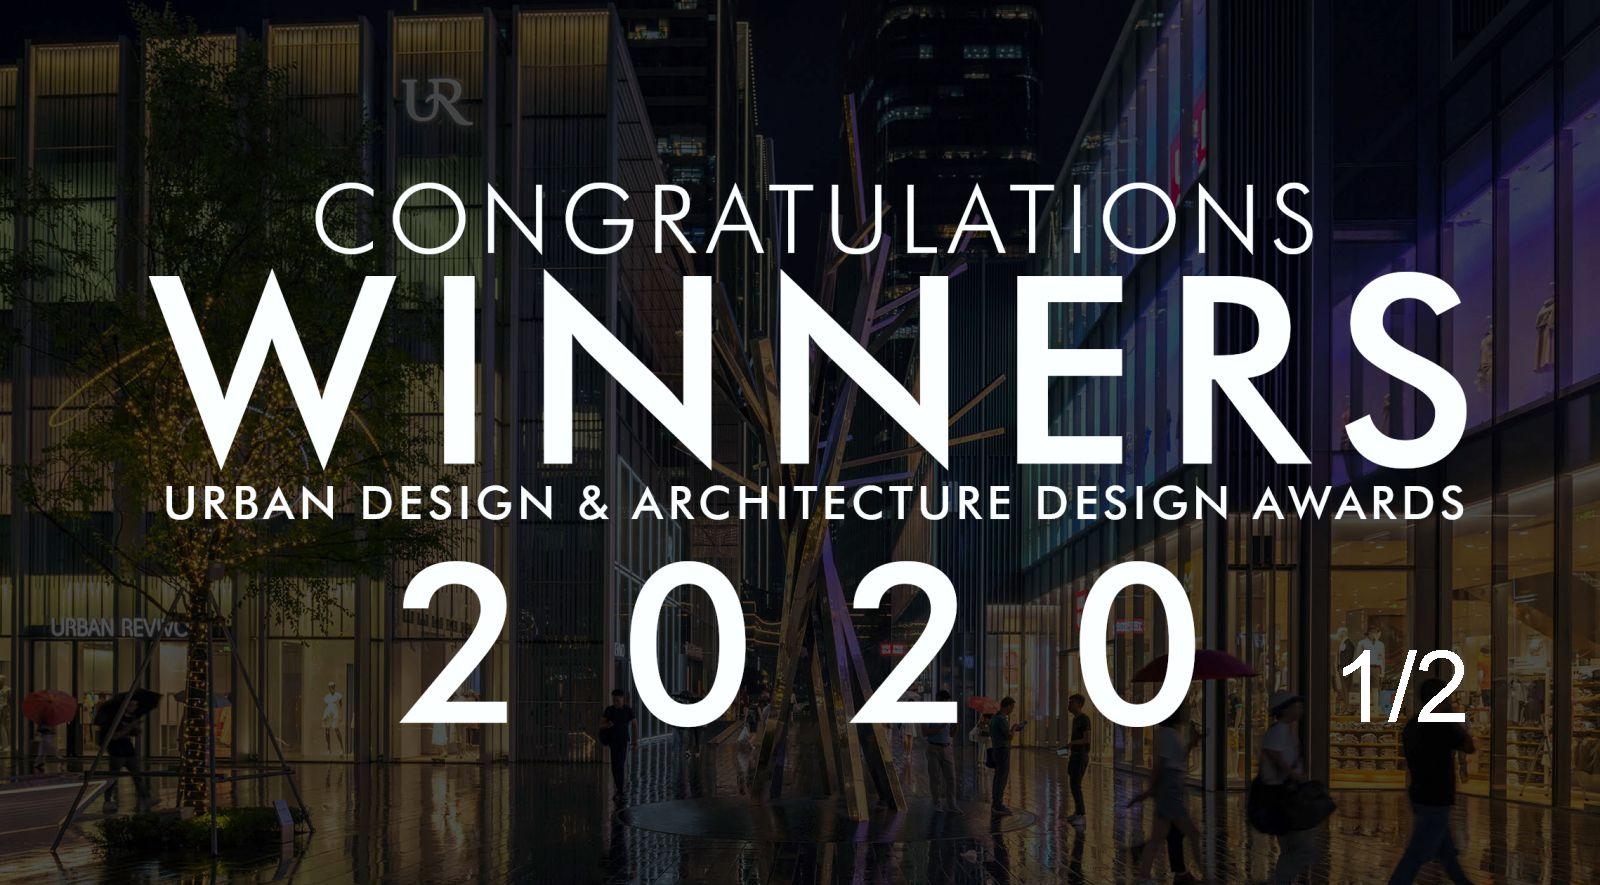 Urban Design & Architecture Design Awards